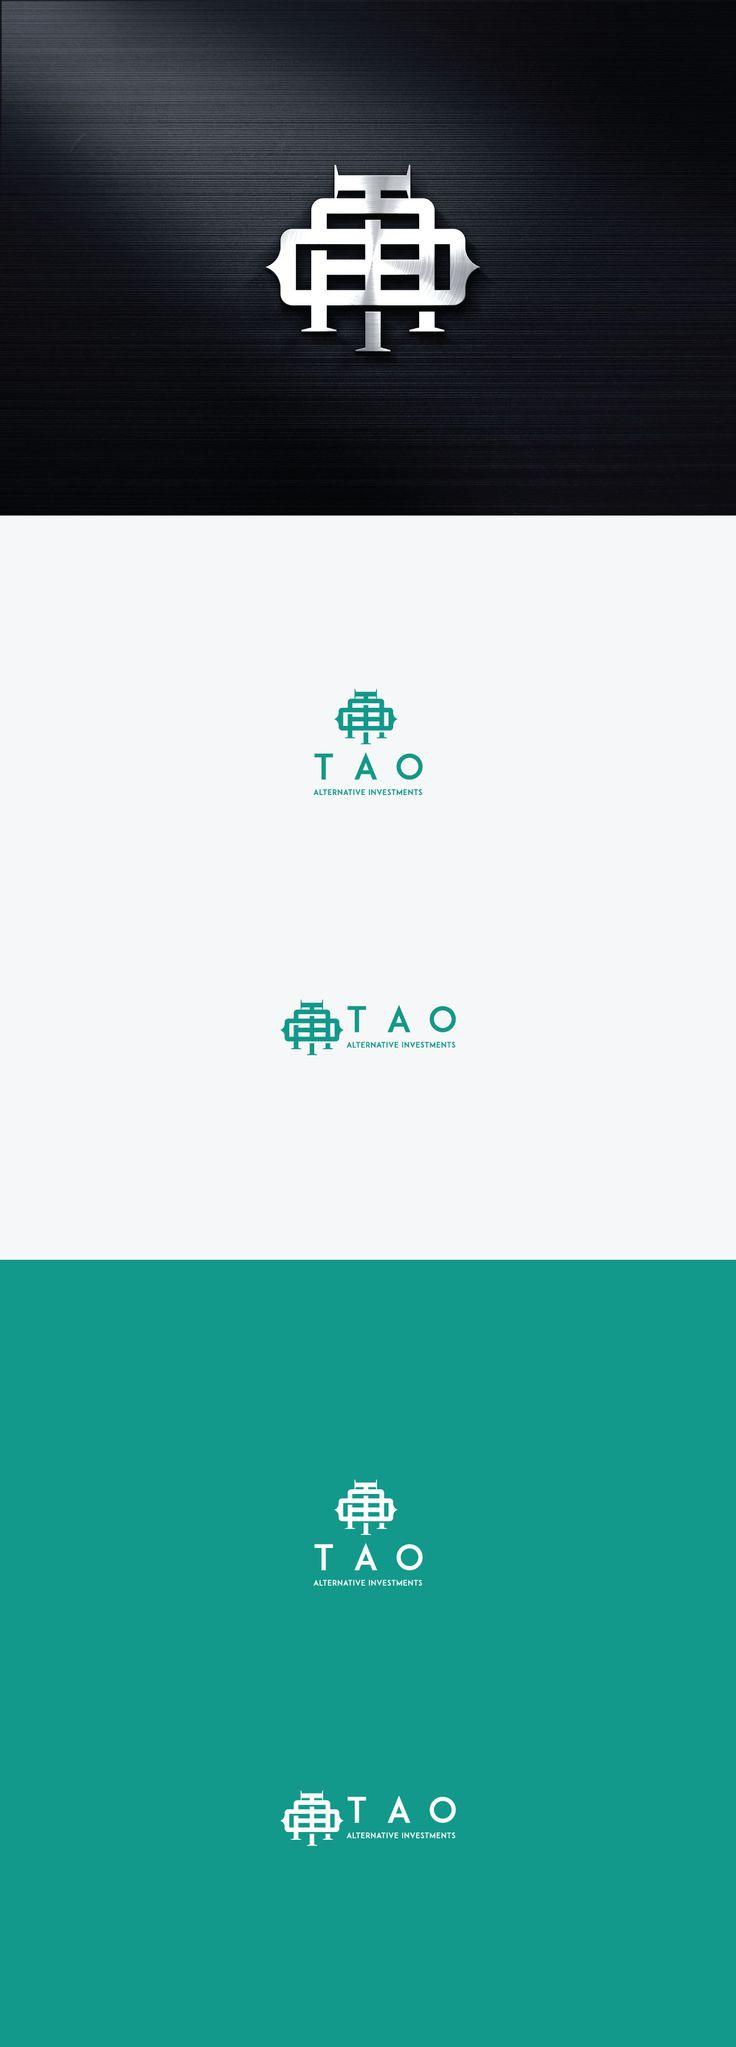 Monogramm logo proposal by SINCRETIX.